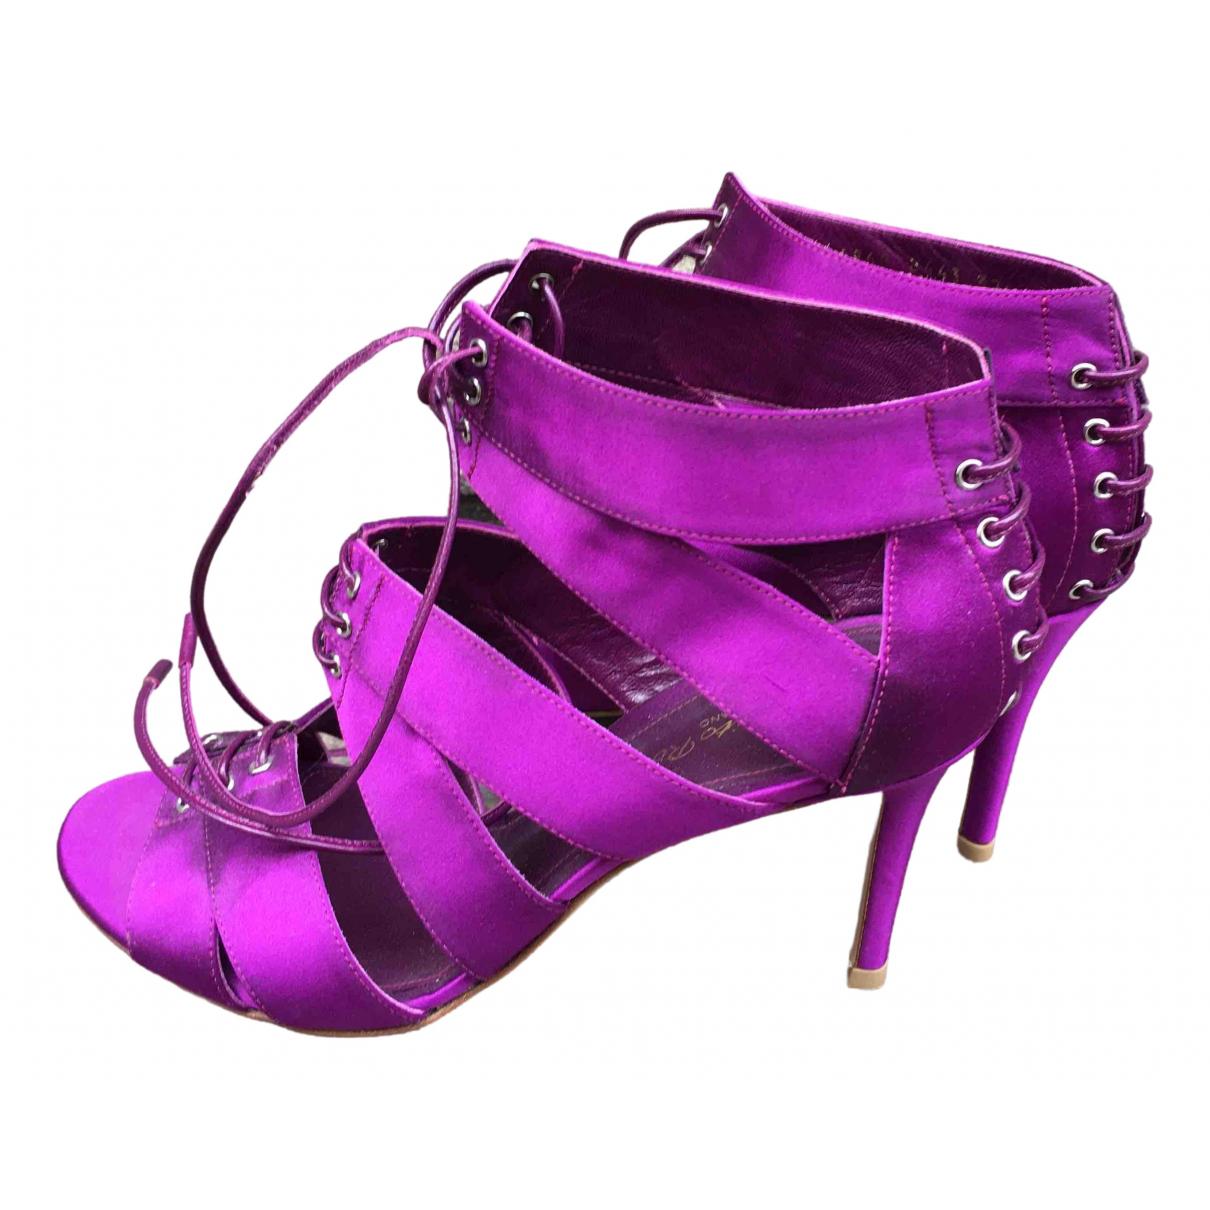 Gianvito Rossi \N Purple Cloth Heels for Women 37.5 EU